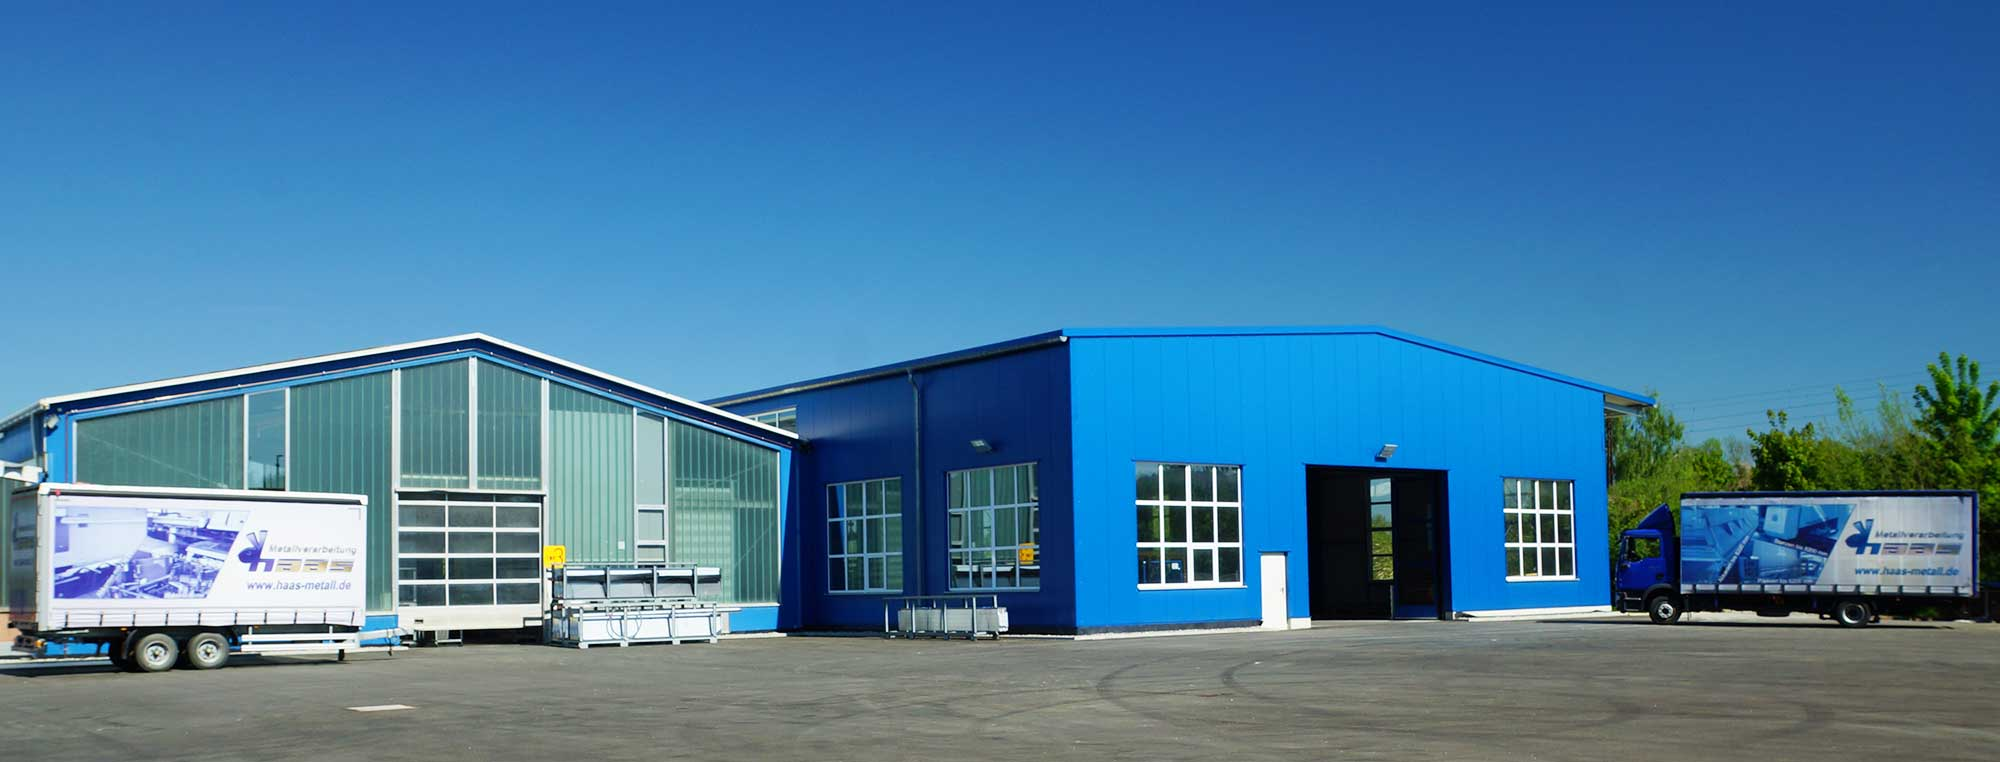 Produktionshalle Firma Haas Offingen